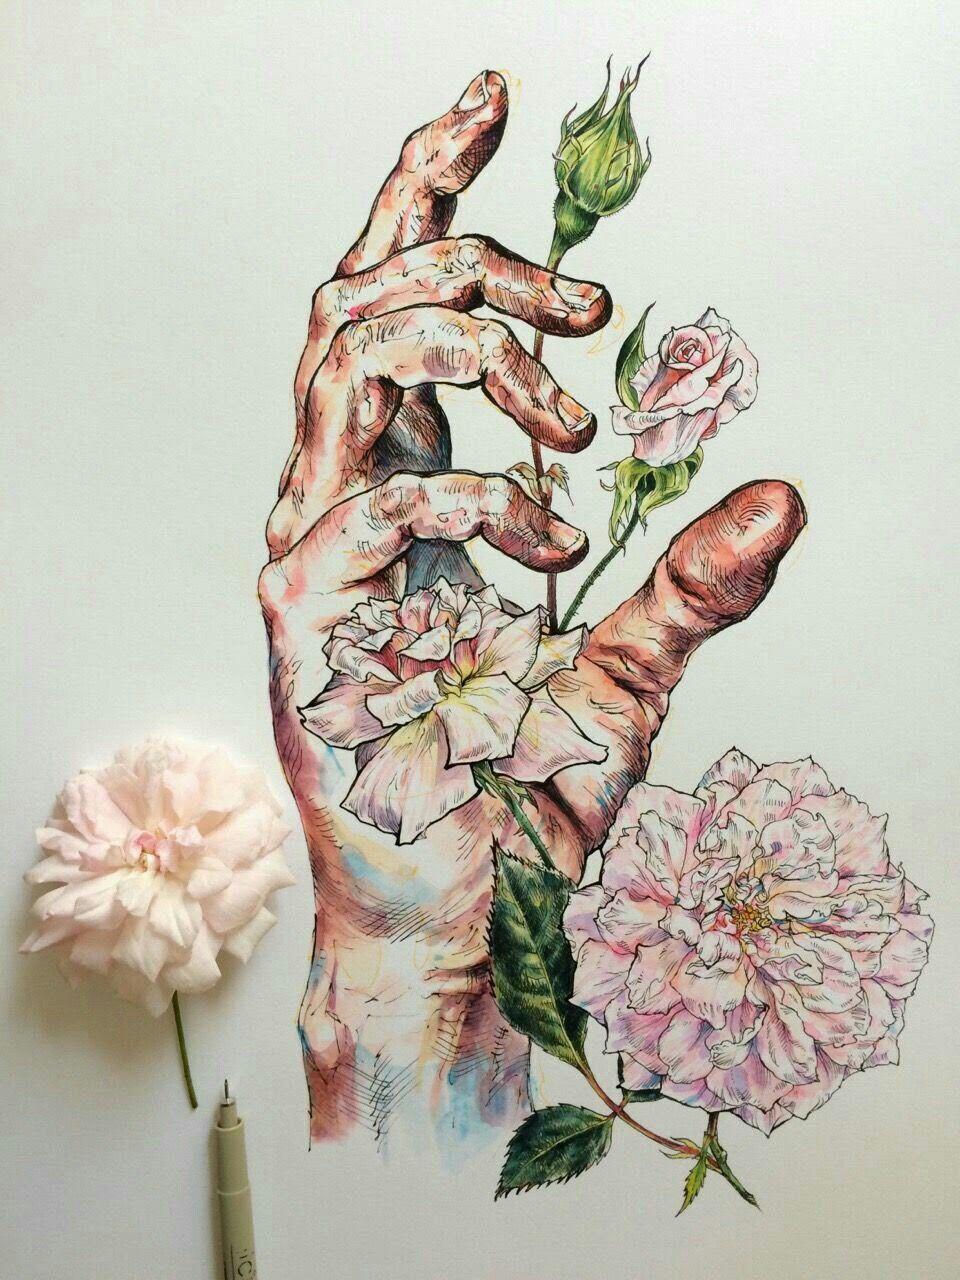 Pin by chan mongsum on illustration pinterest illustrators